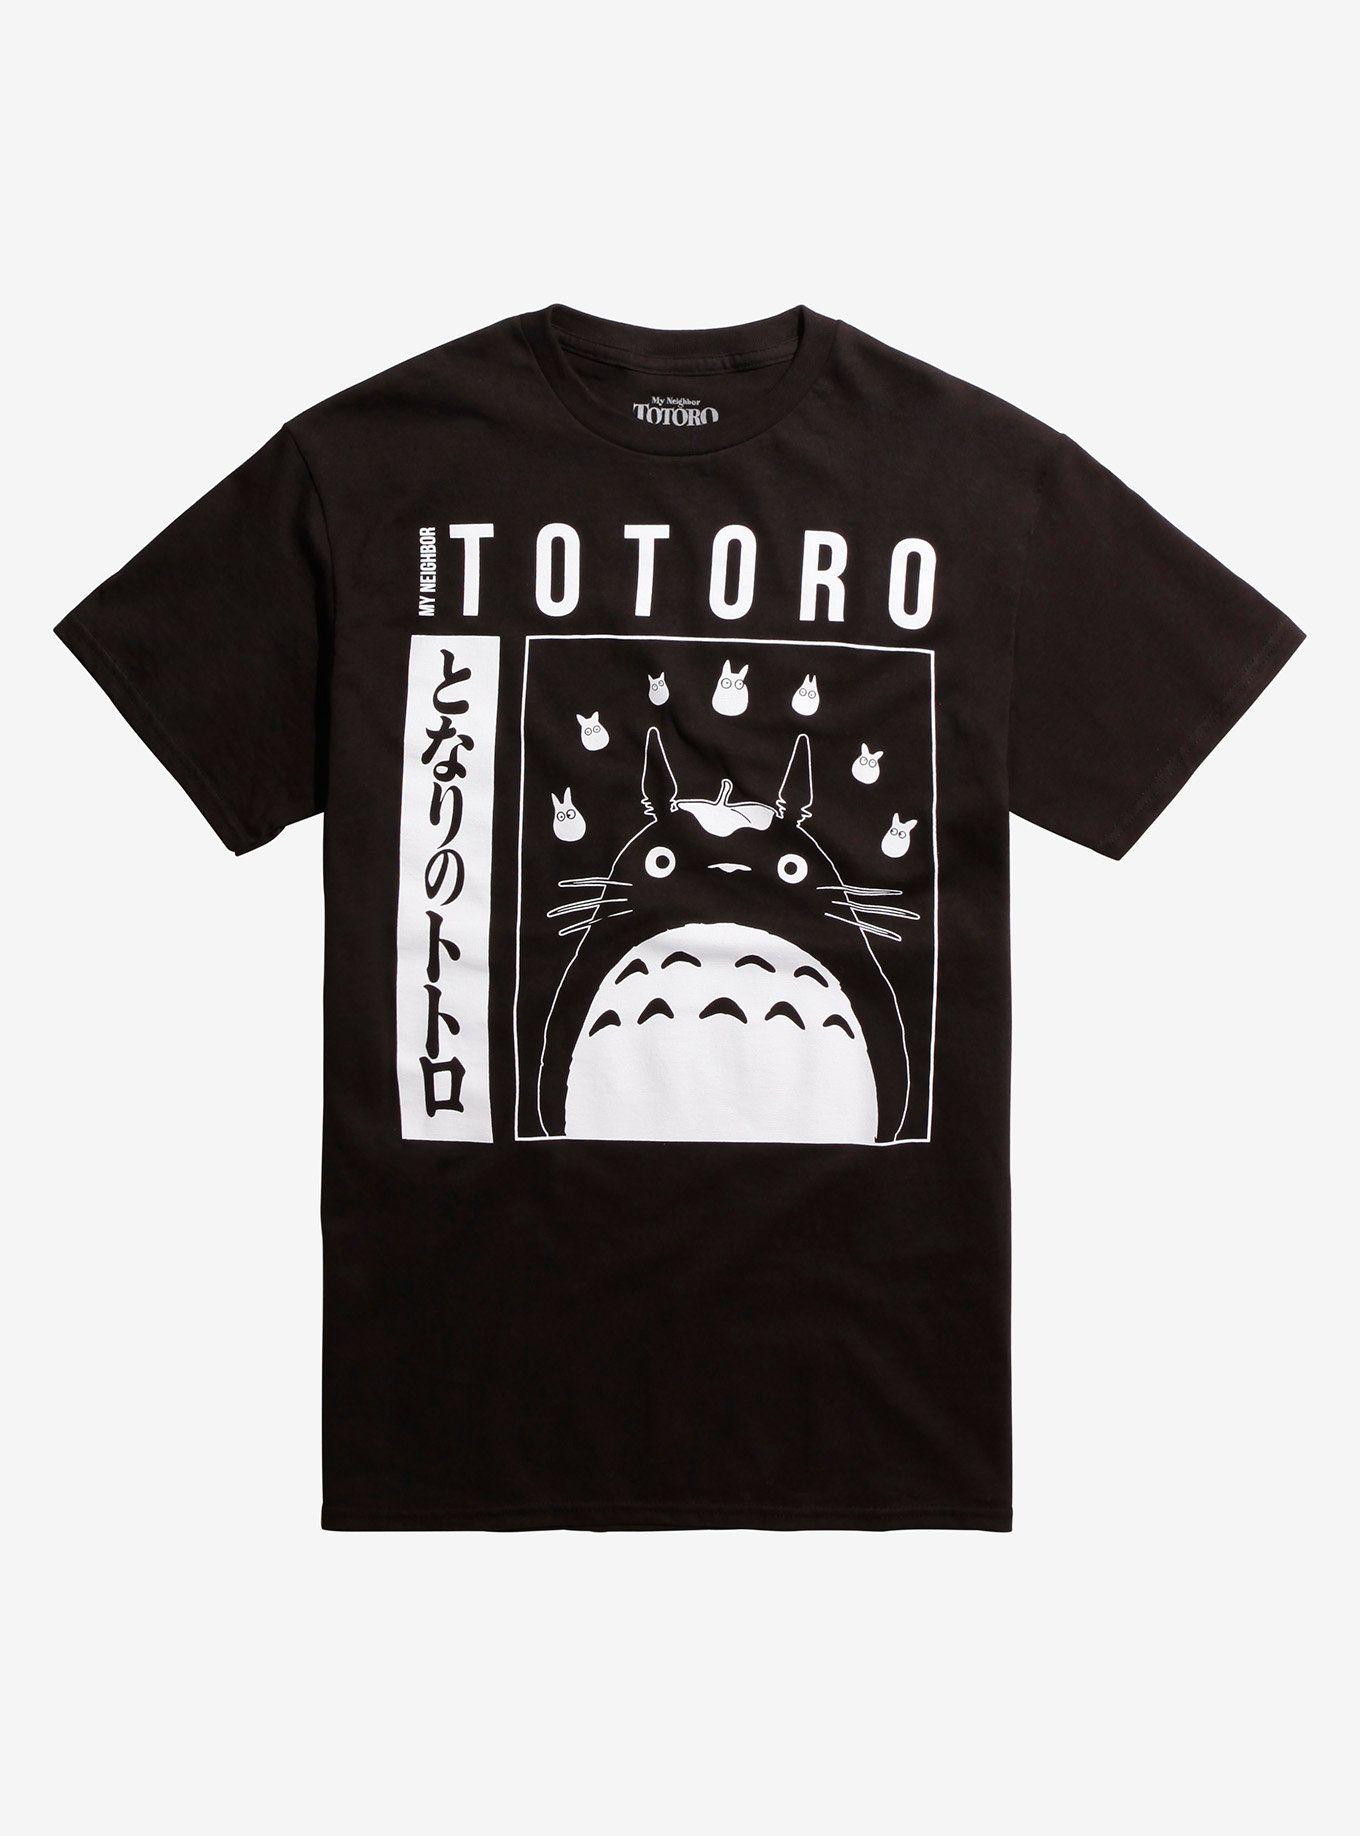 Studio Ghibli My Neighbor Totoro Kanji Totoro T Shirt Roupas Nerd Costumizacao De Roupas Roupas Bonitas [ 1836 x 1360 Pixel ]